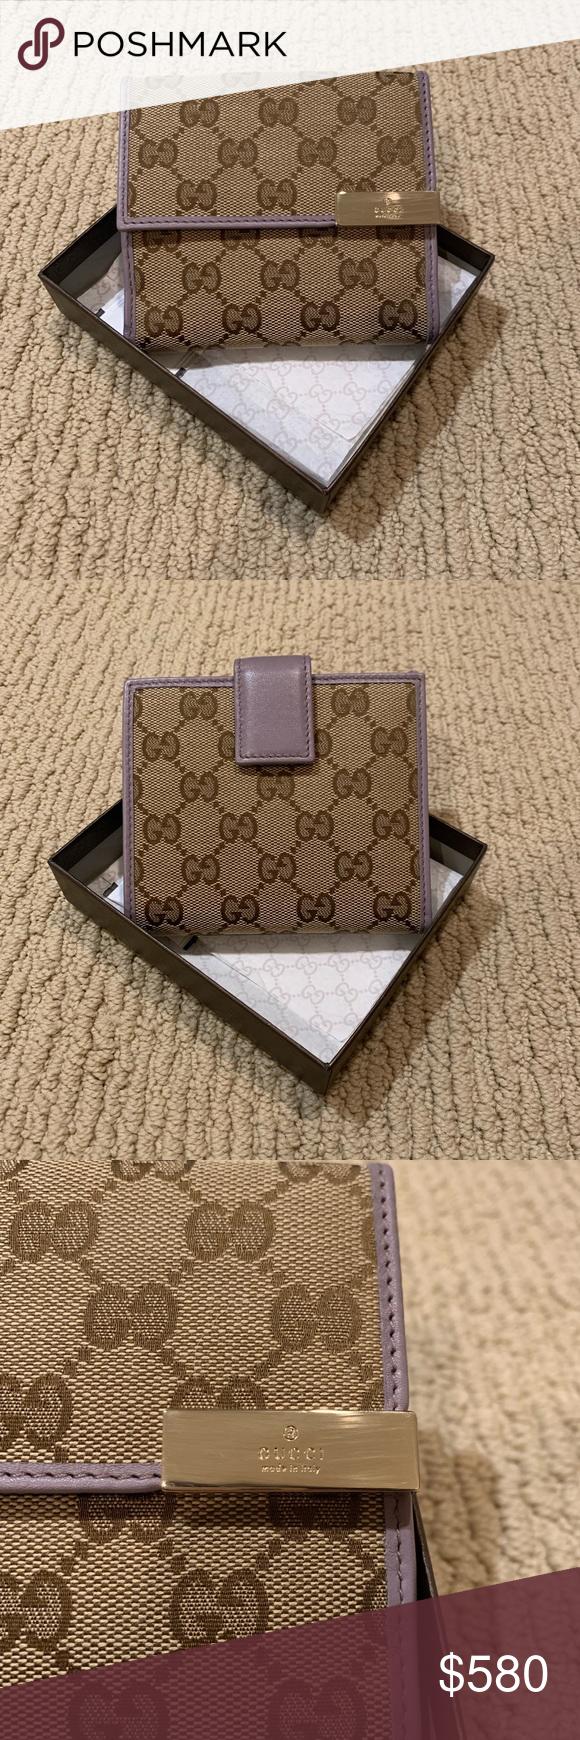 ae96a5cdd44d NWT Authentic Gucci Medium Bifold Wallet Very cute Gucci Medium ...